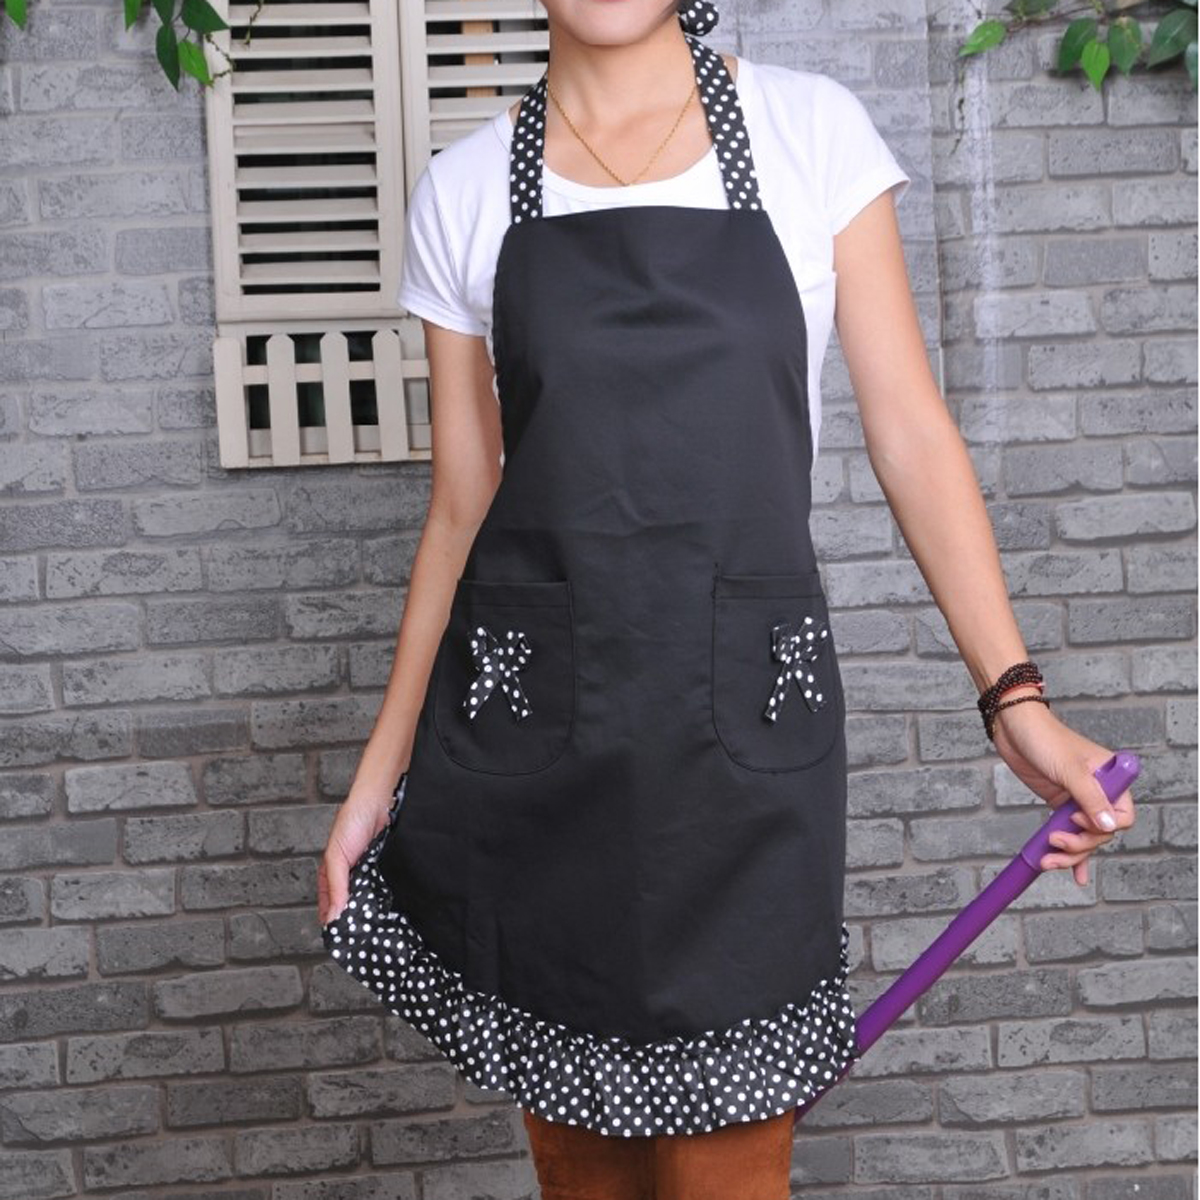 White apron ladies - 2017new Cute Nice Princess Style Dots Pattern Falbala Kitchen Cooking Apron Women Ladies Apron With 2